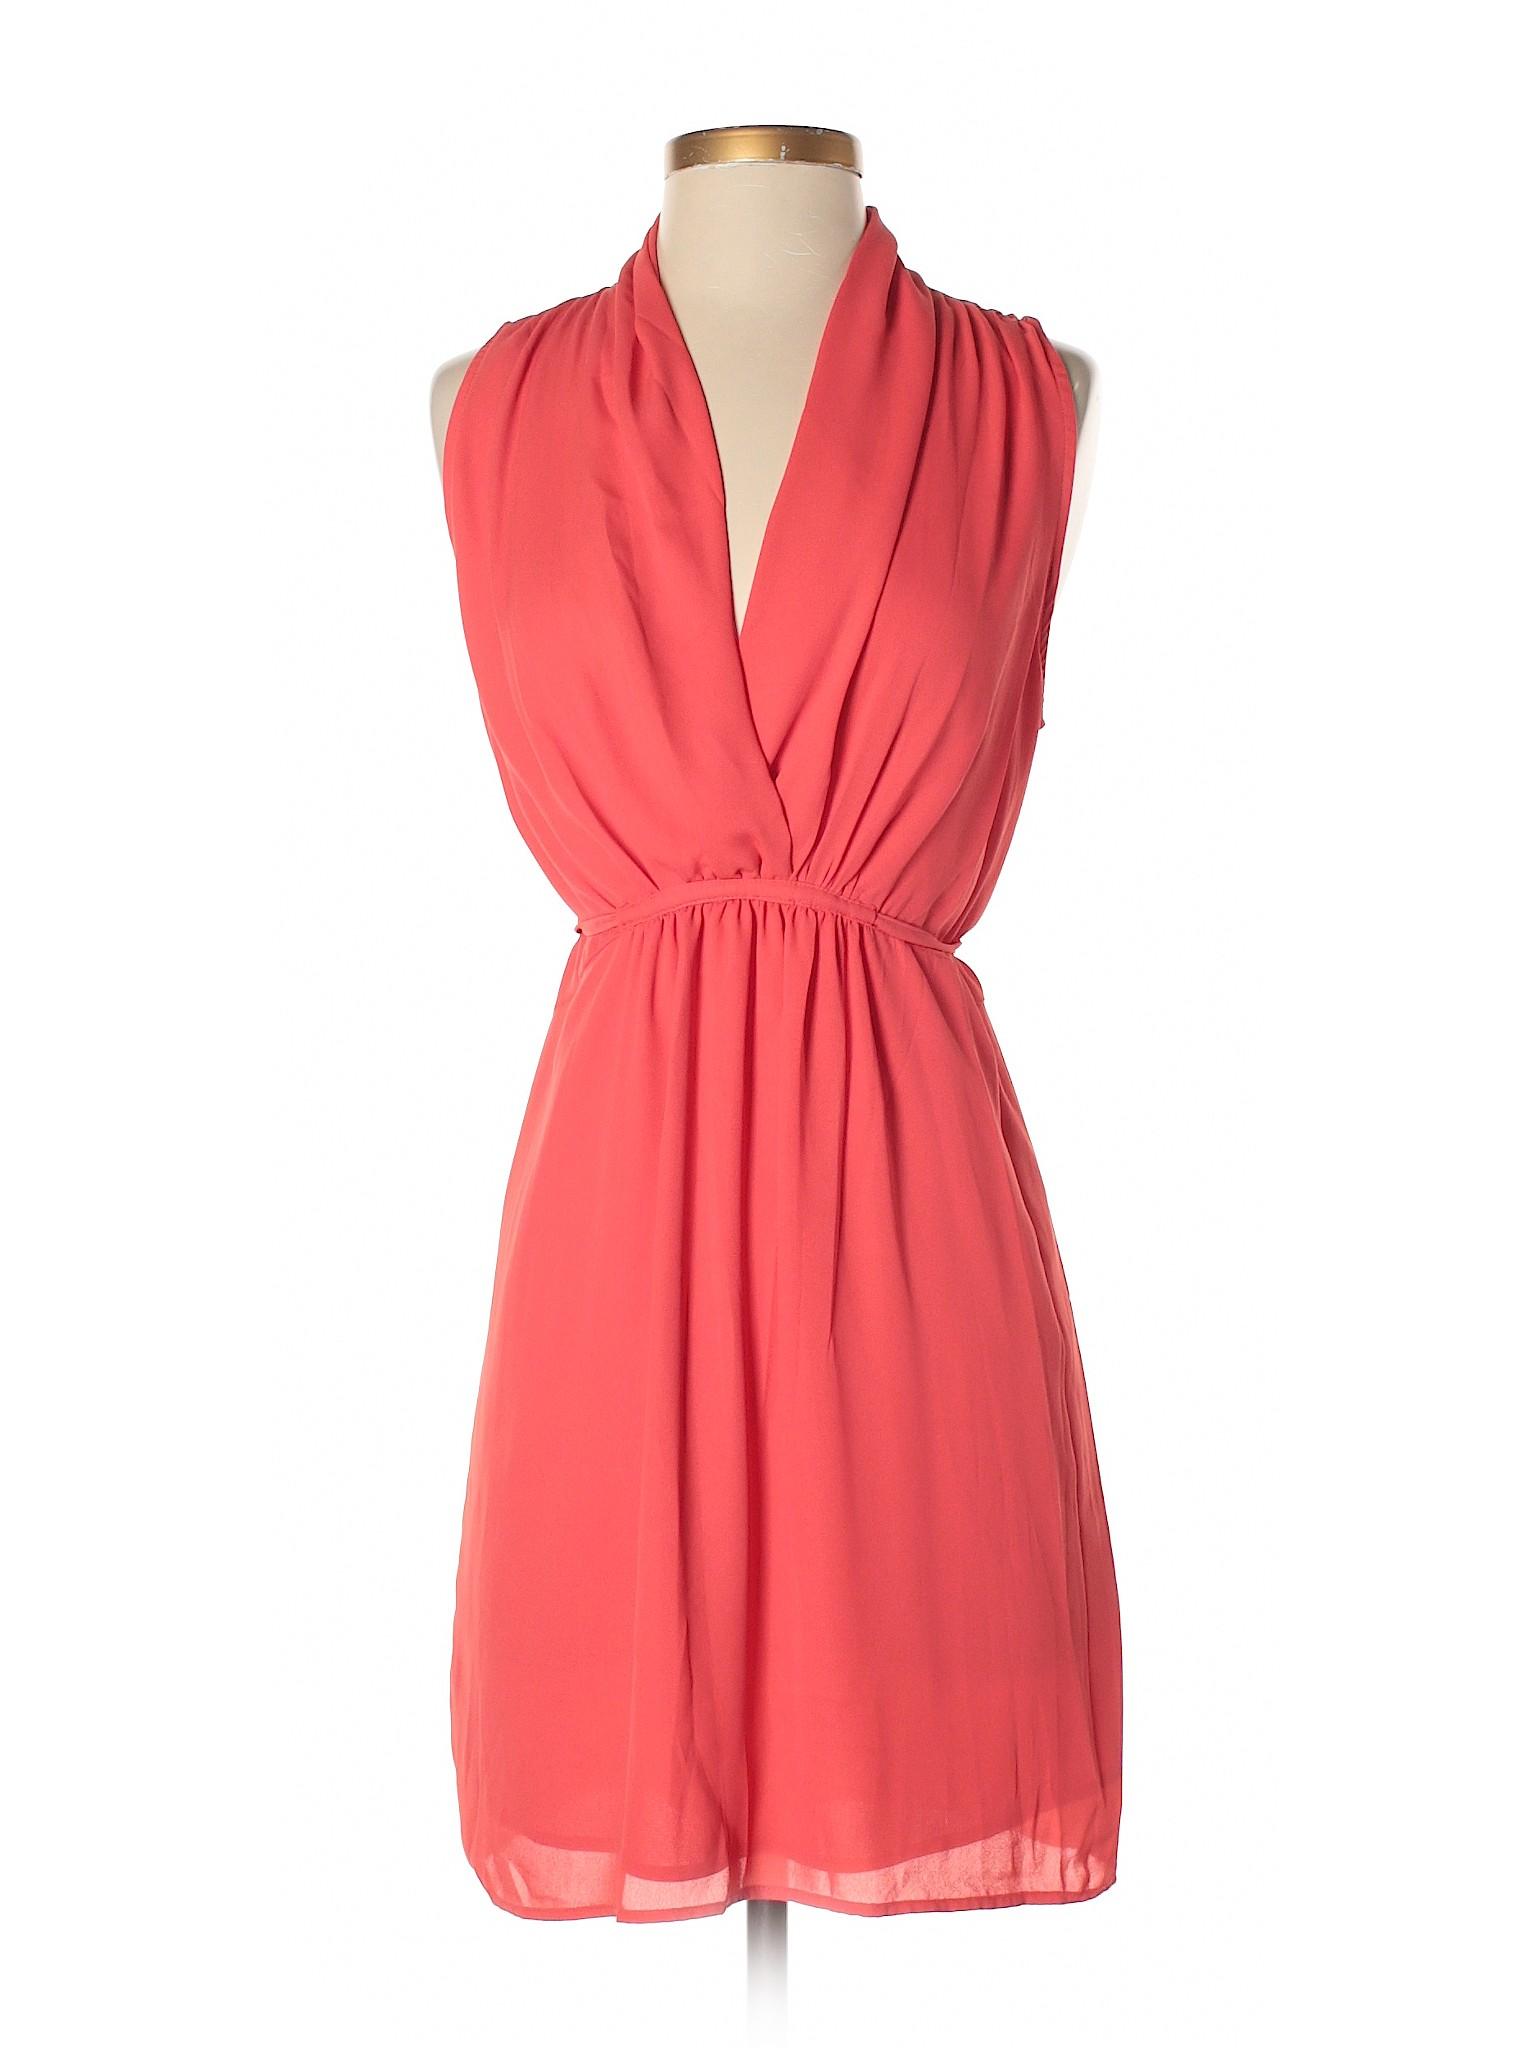 Casual Winter Collective Dress Concepts Boutique BafwSq8x